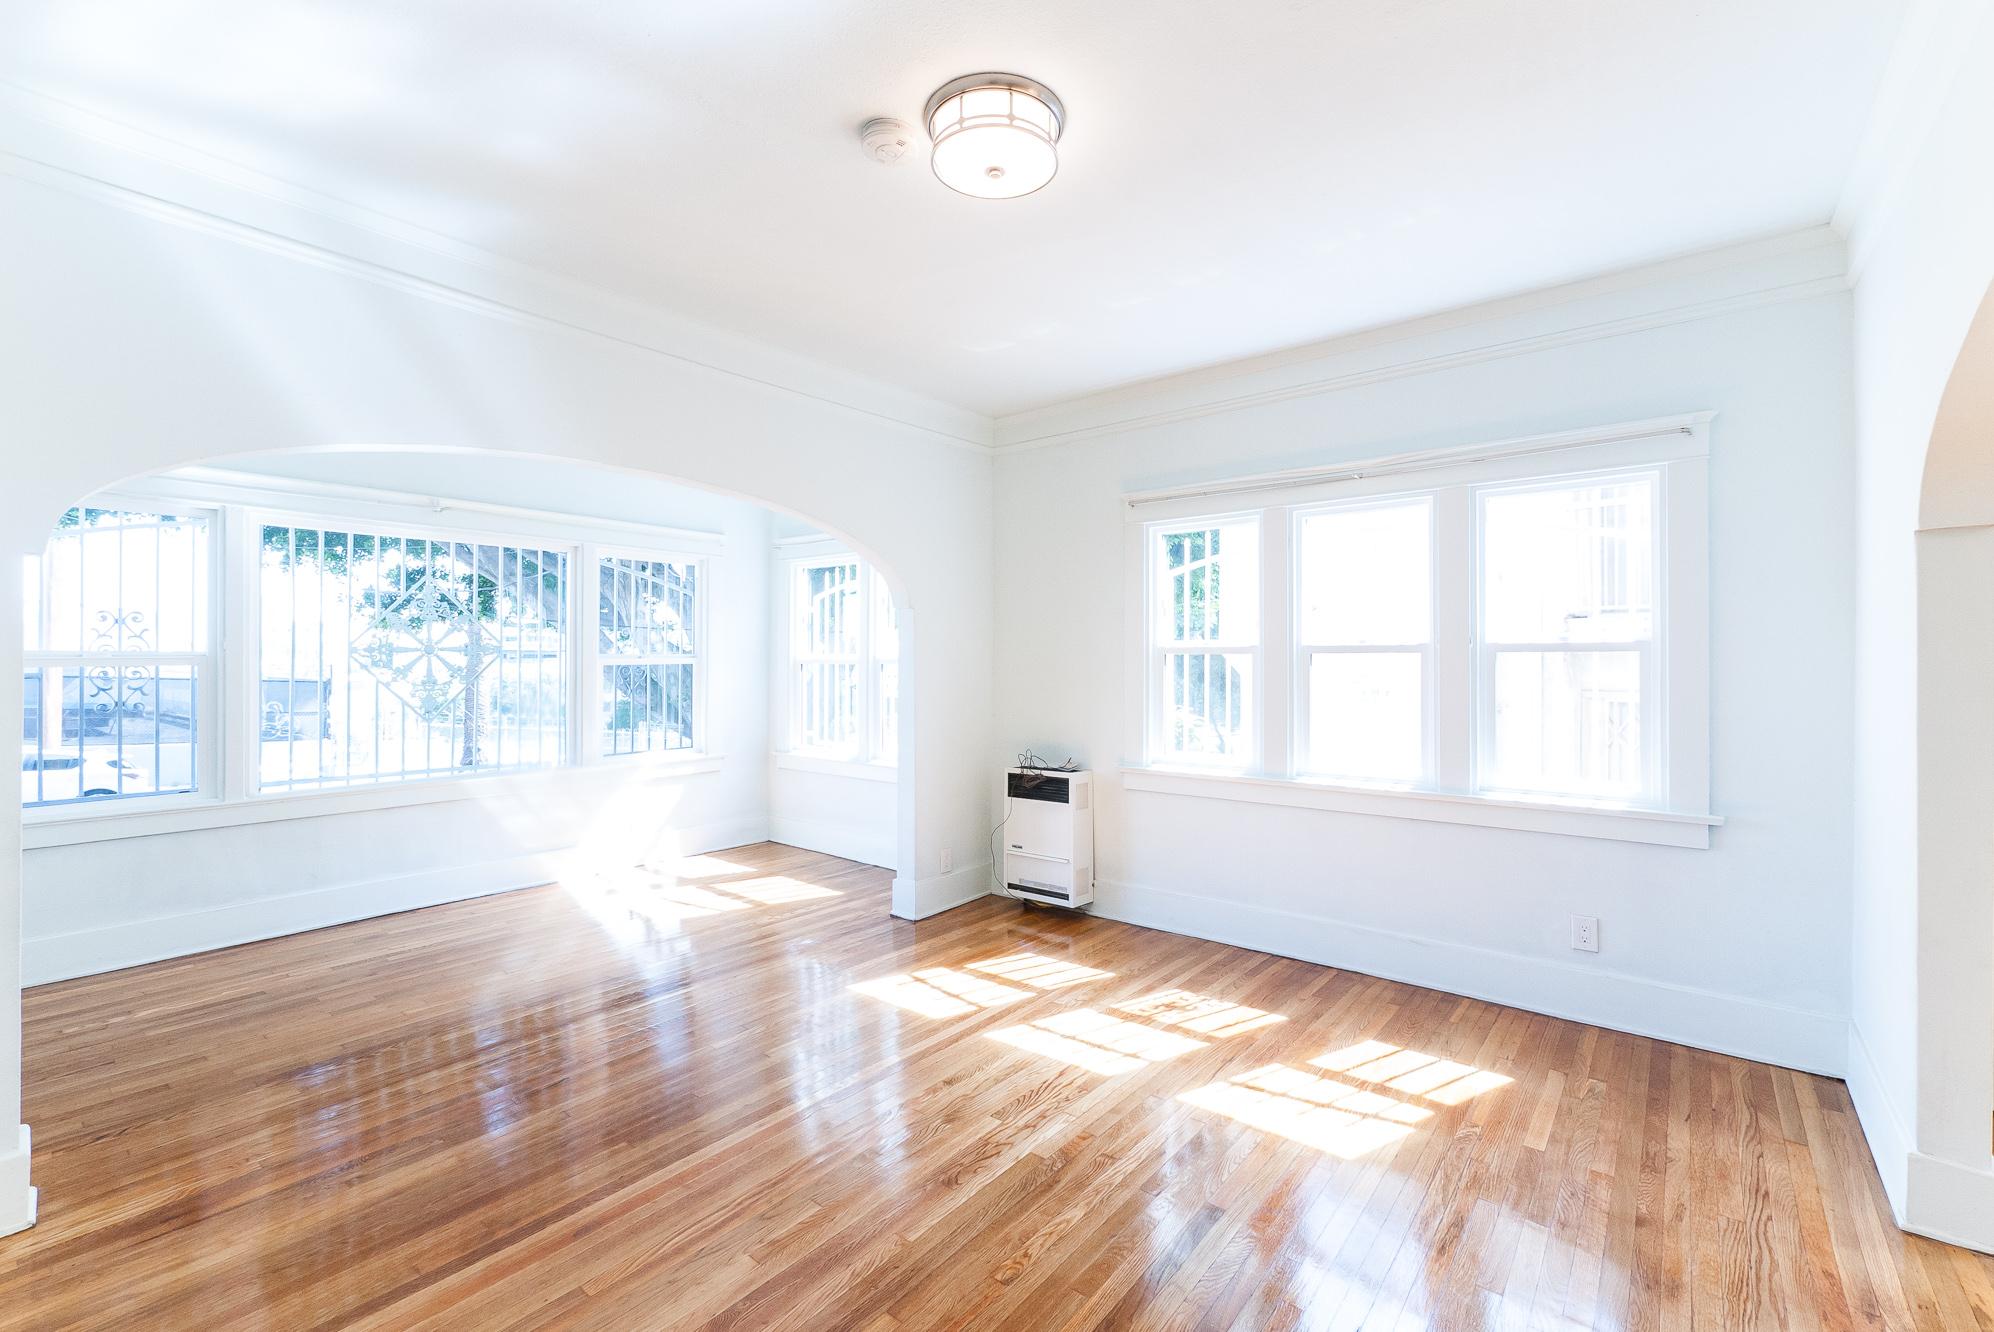 Original hardwood floors | Large 3 bed | Storage, Sunroom & outdoor Space | Near Echo Park & DTLA | Washer & Dryer in Unit!